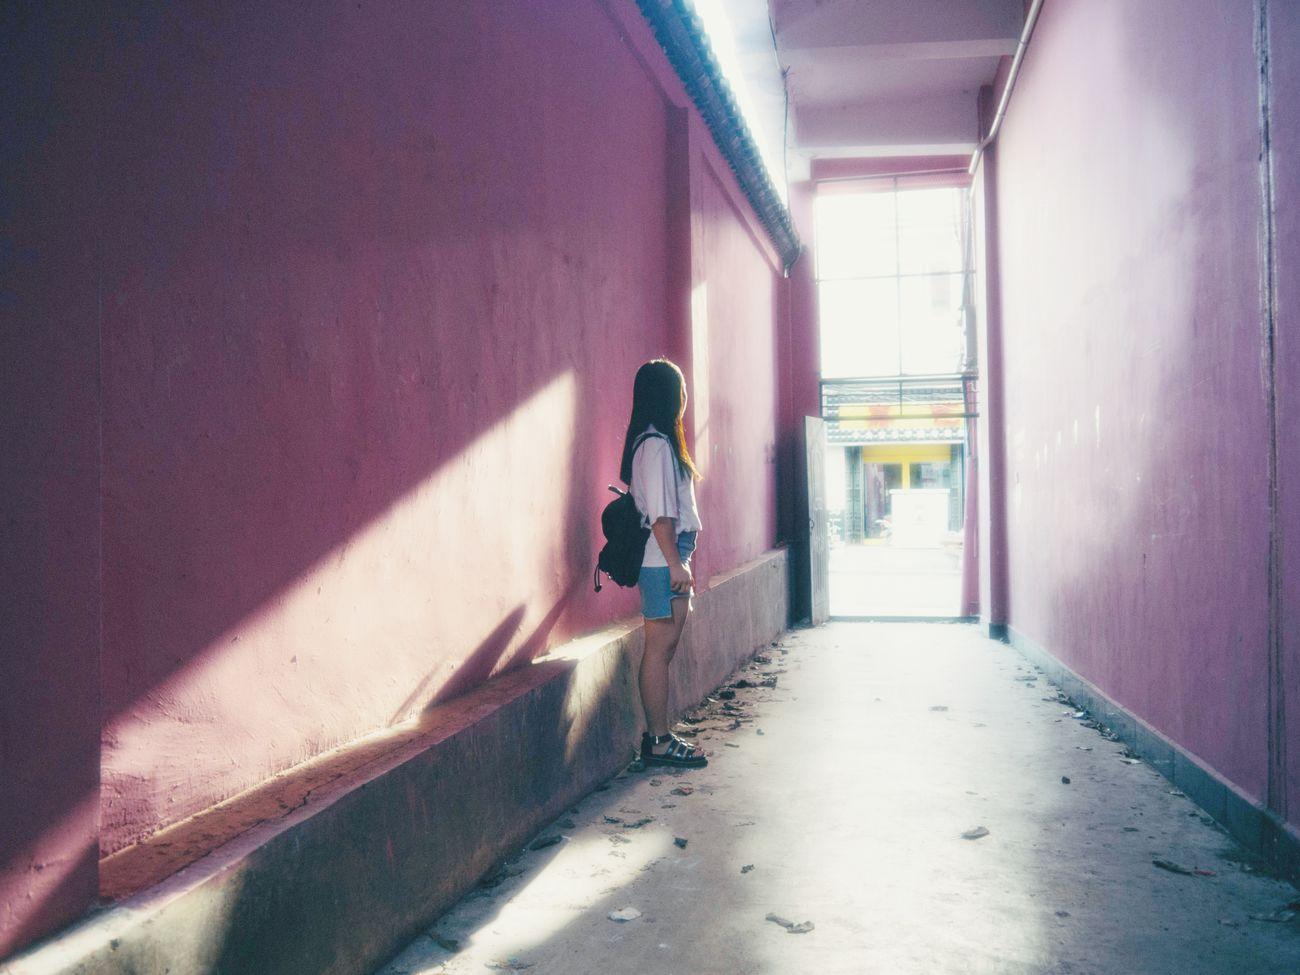 People Photography Girl 之前看过川内伦子,挺喜欢的,这次想试试看,感觉没有模糊到位。😦